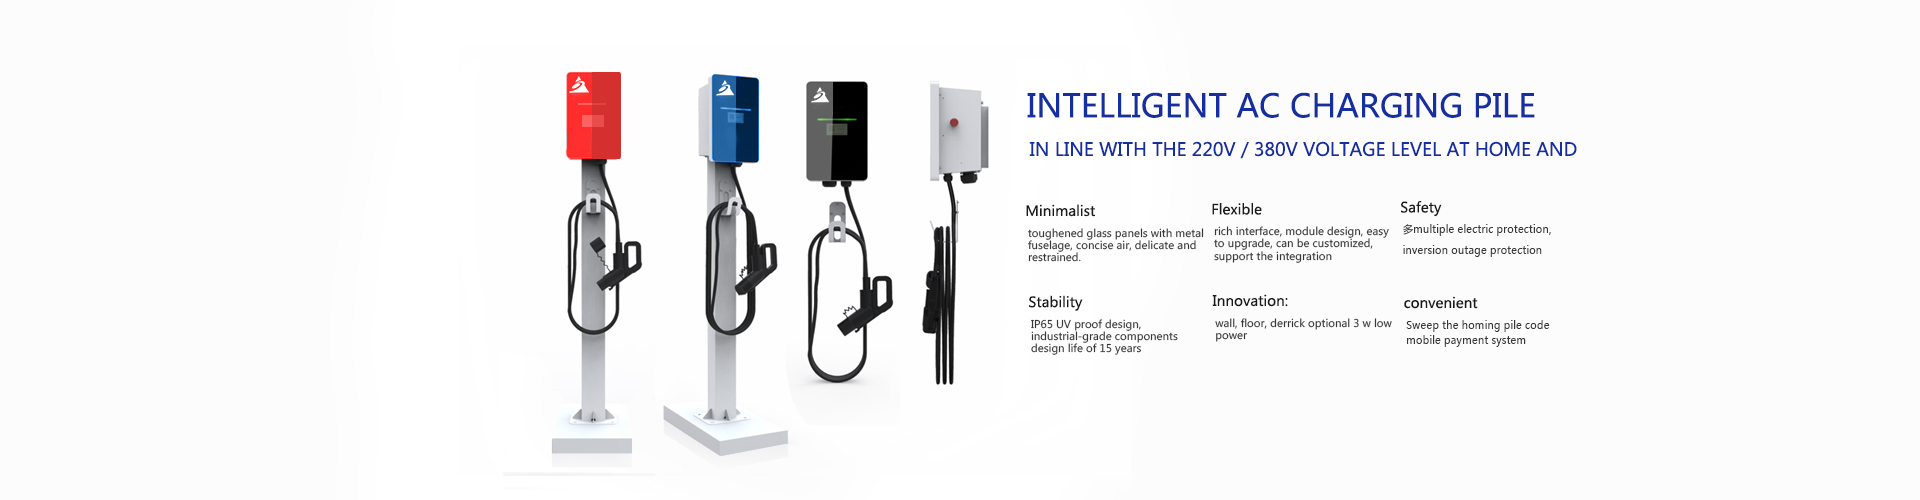 Intelligent AC charging pile